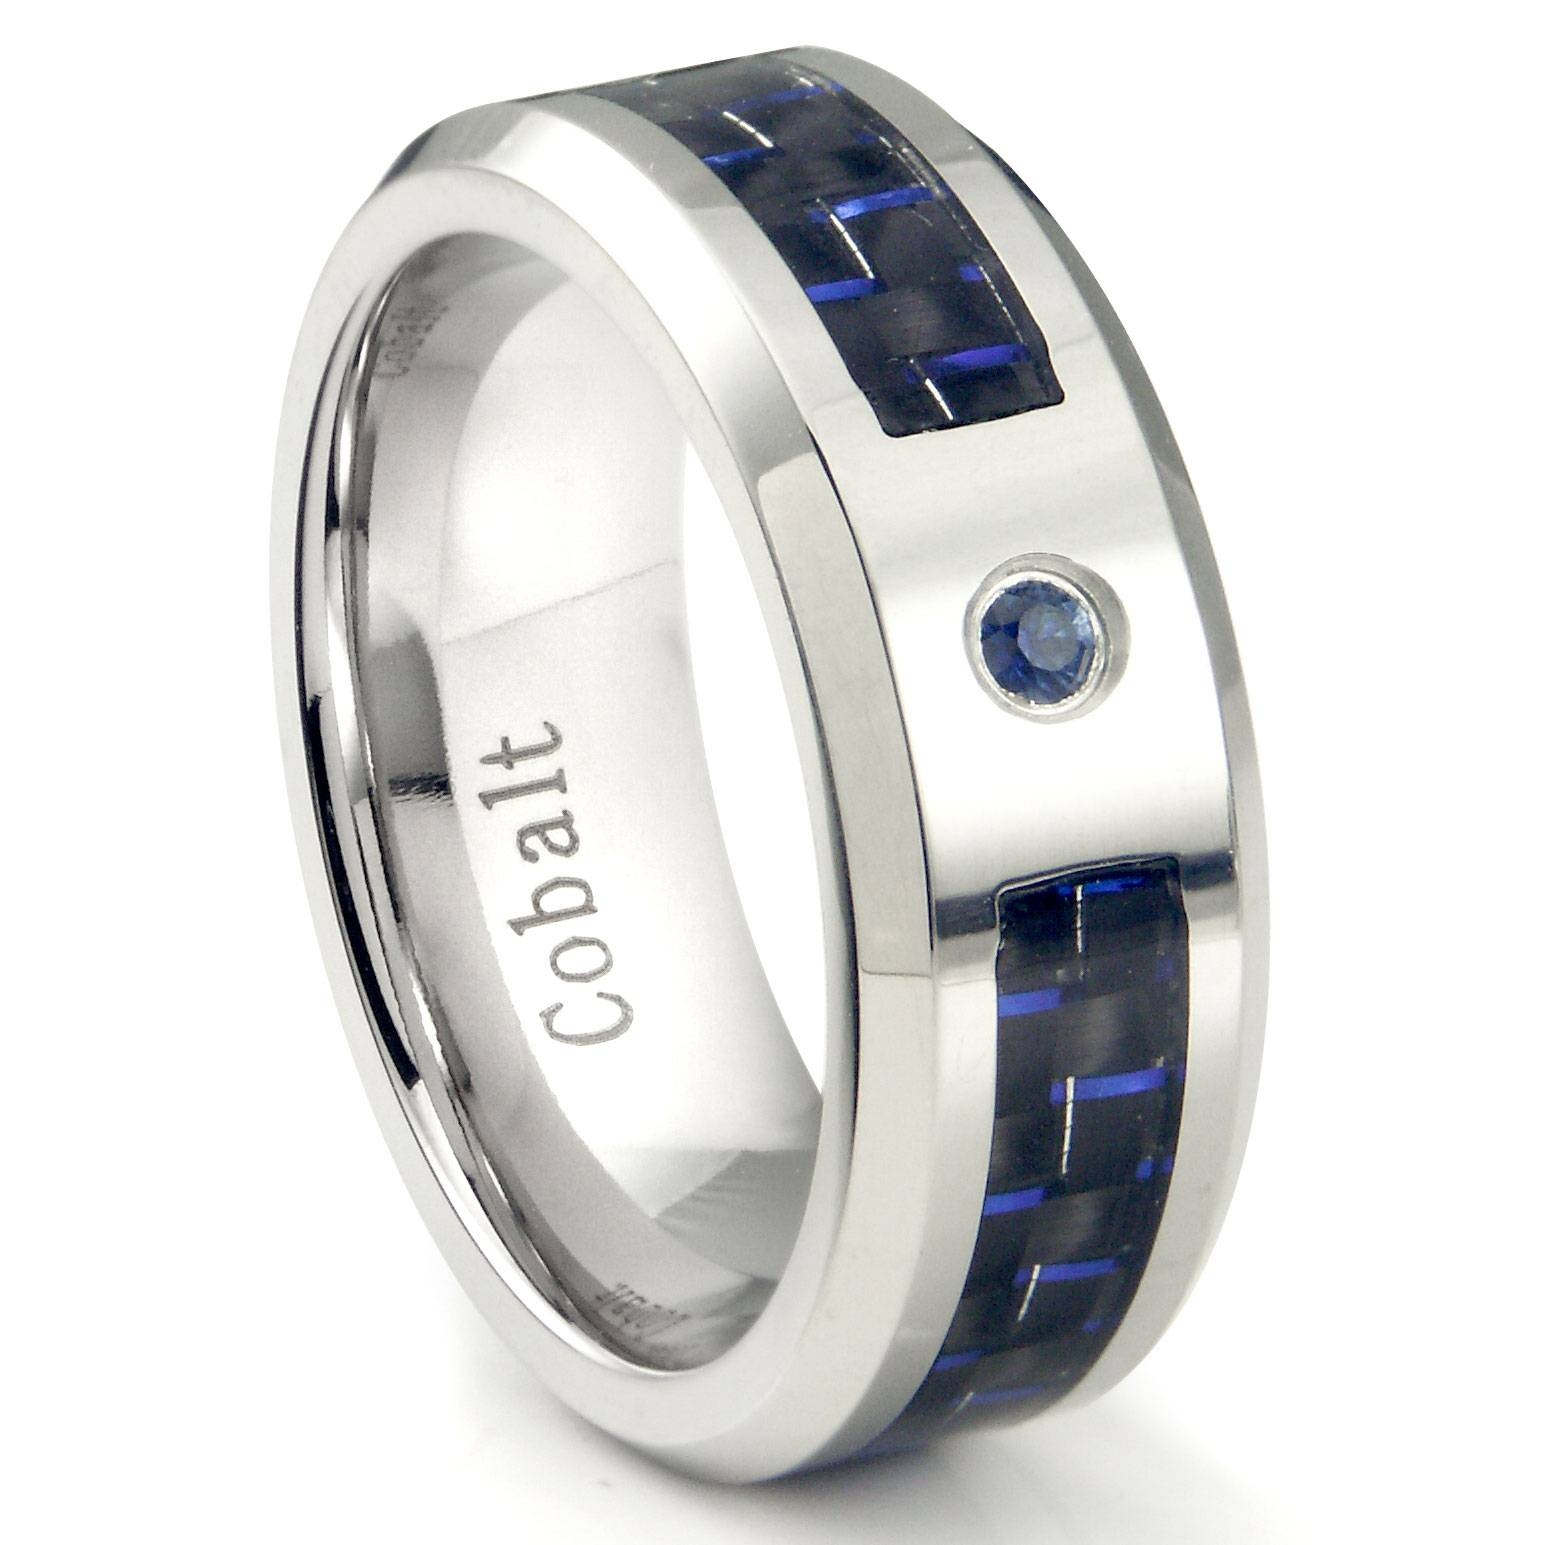 Cobalt Chrome 8Mm Blue Sapphire & Blue Carbon Fiber Inlay Wedding Throughout Cobalt Mens Wedding Rings (View 5 of 15)